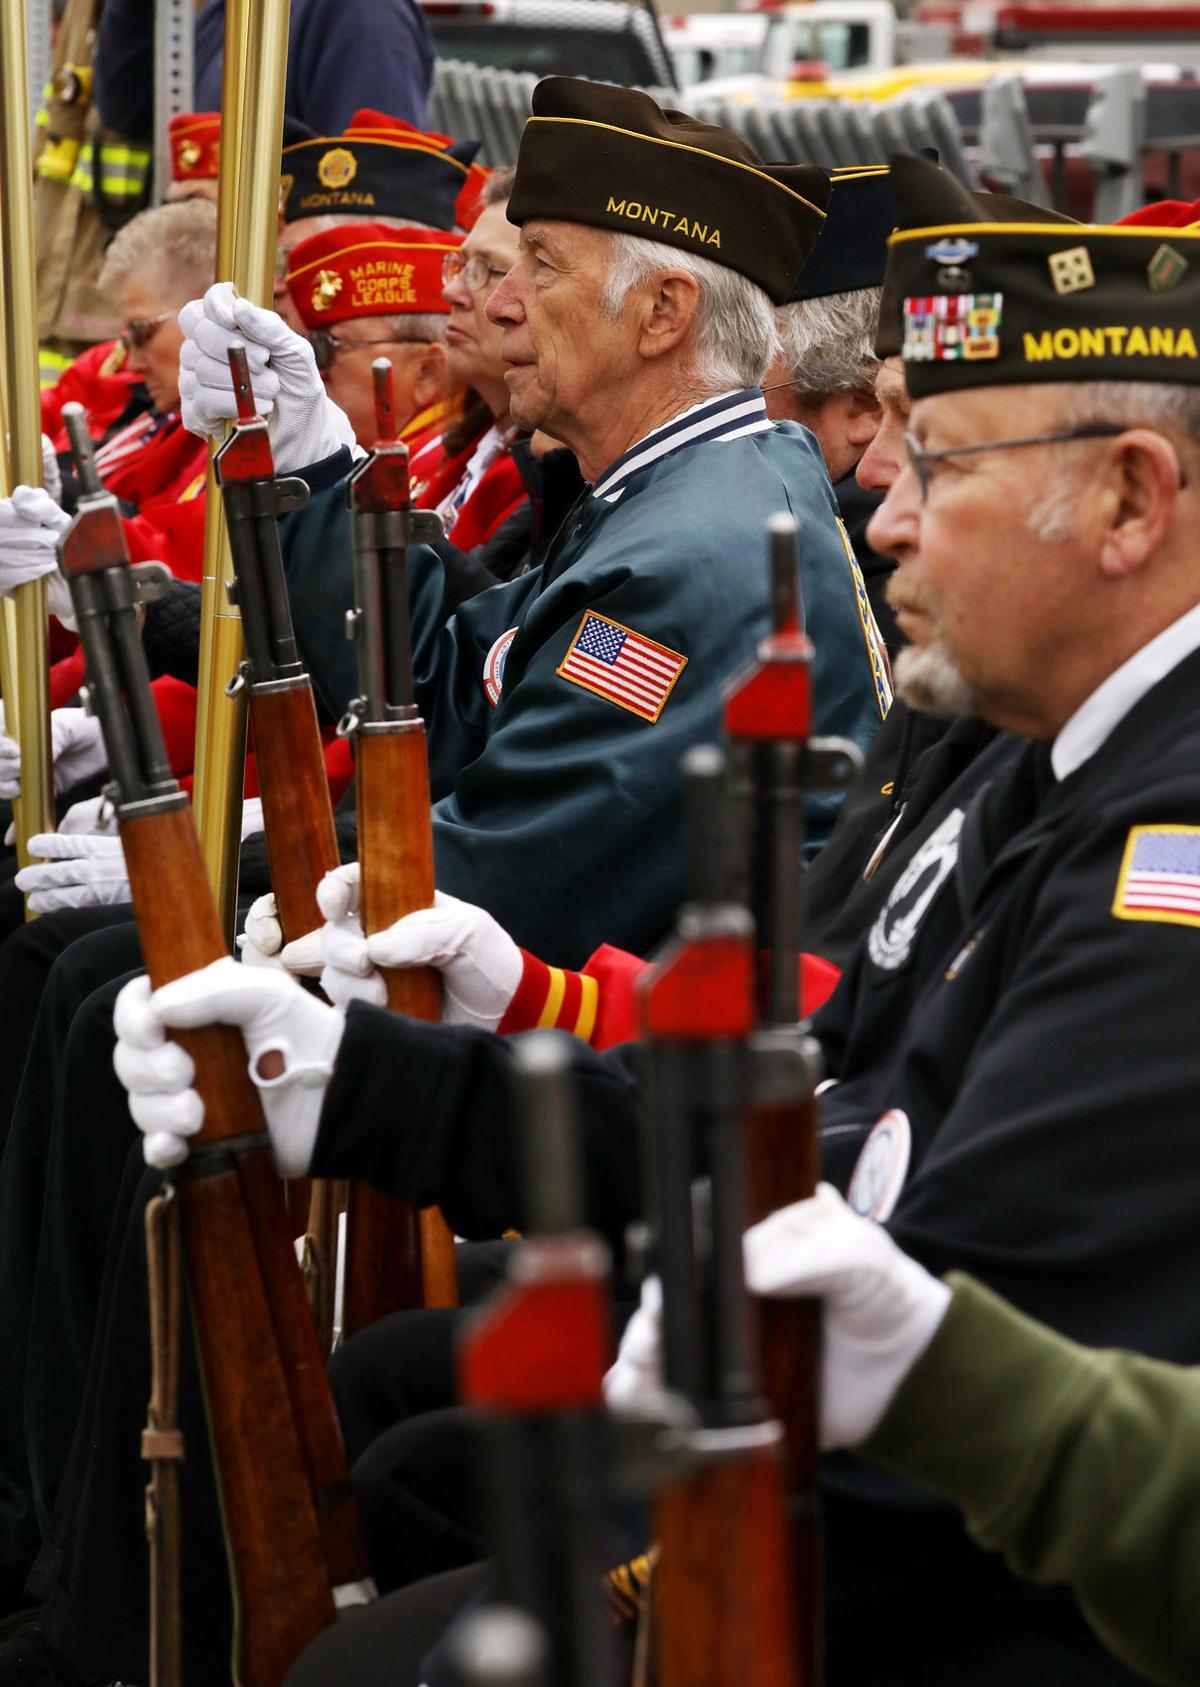 Southwest Montana United Veteran's Council Honor Guard at Stodden Park